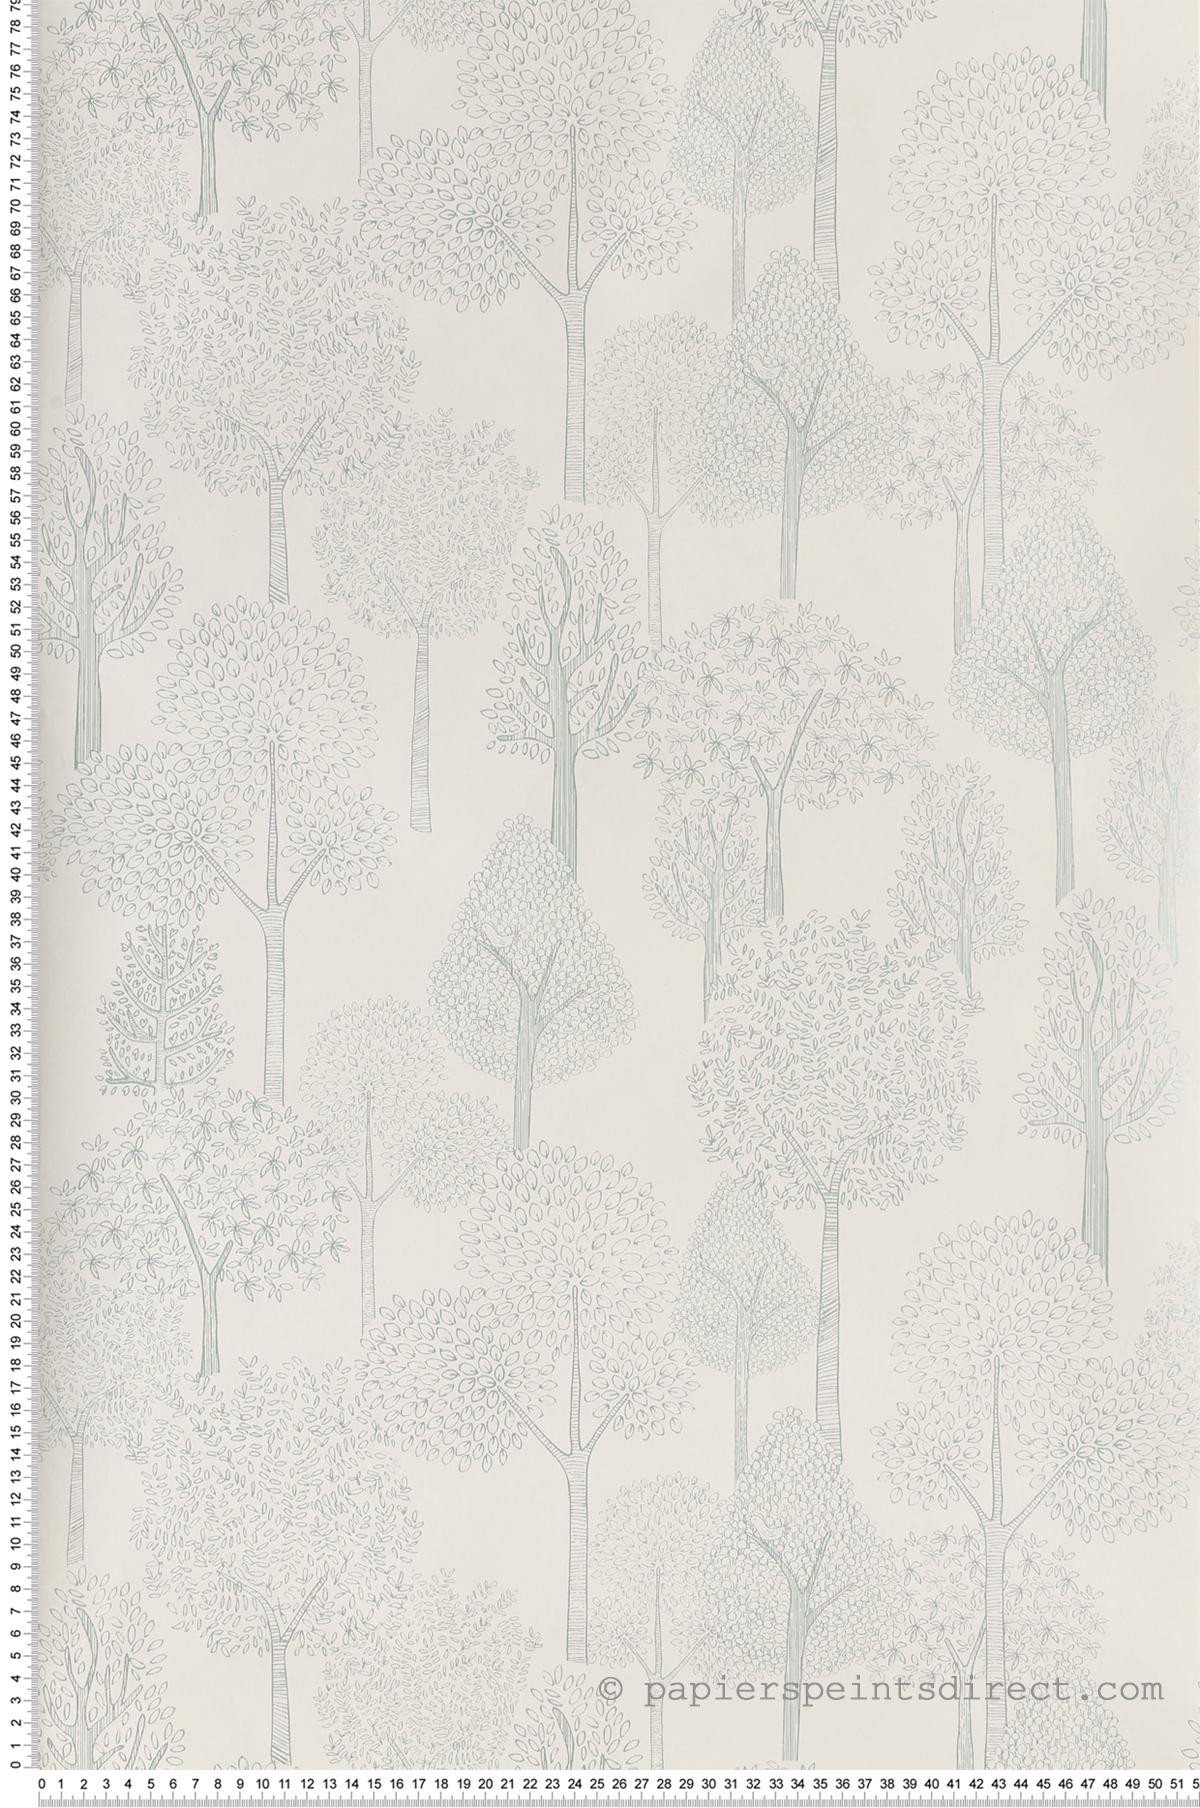 Arbres irisés menthe - Collection Dwell Studio de York by Initiales